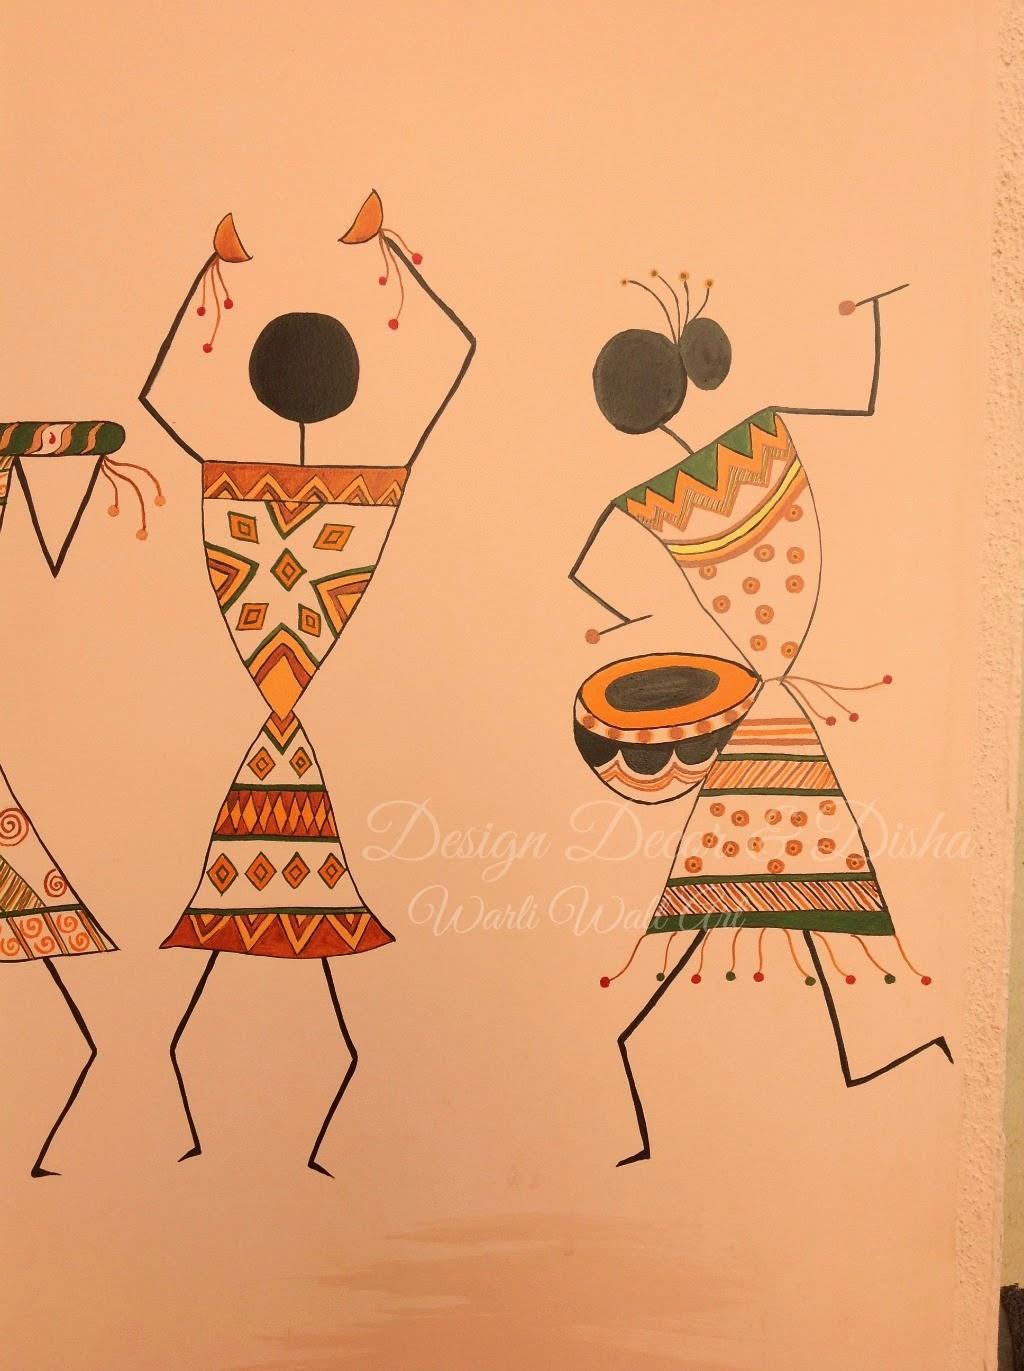 Warli designs on wall